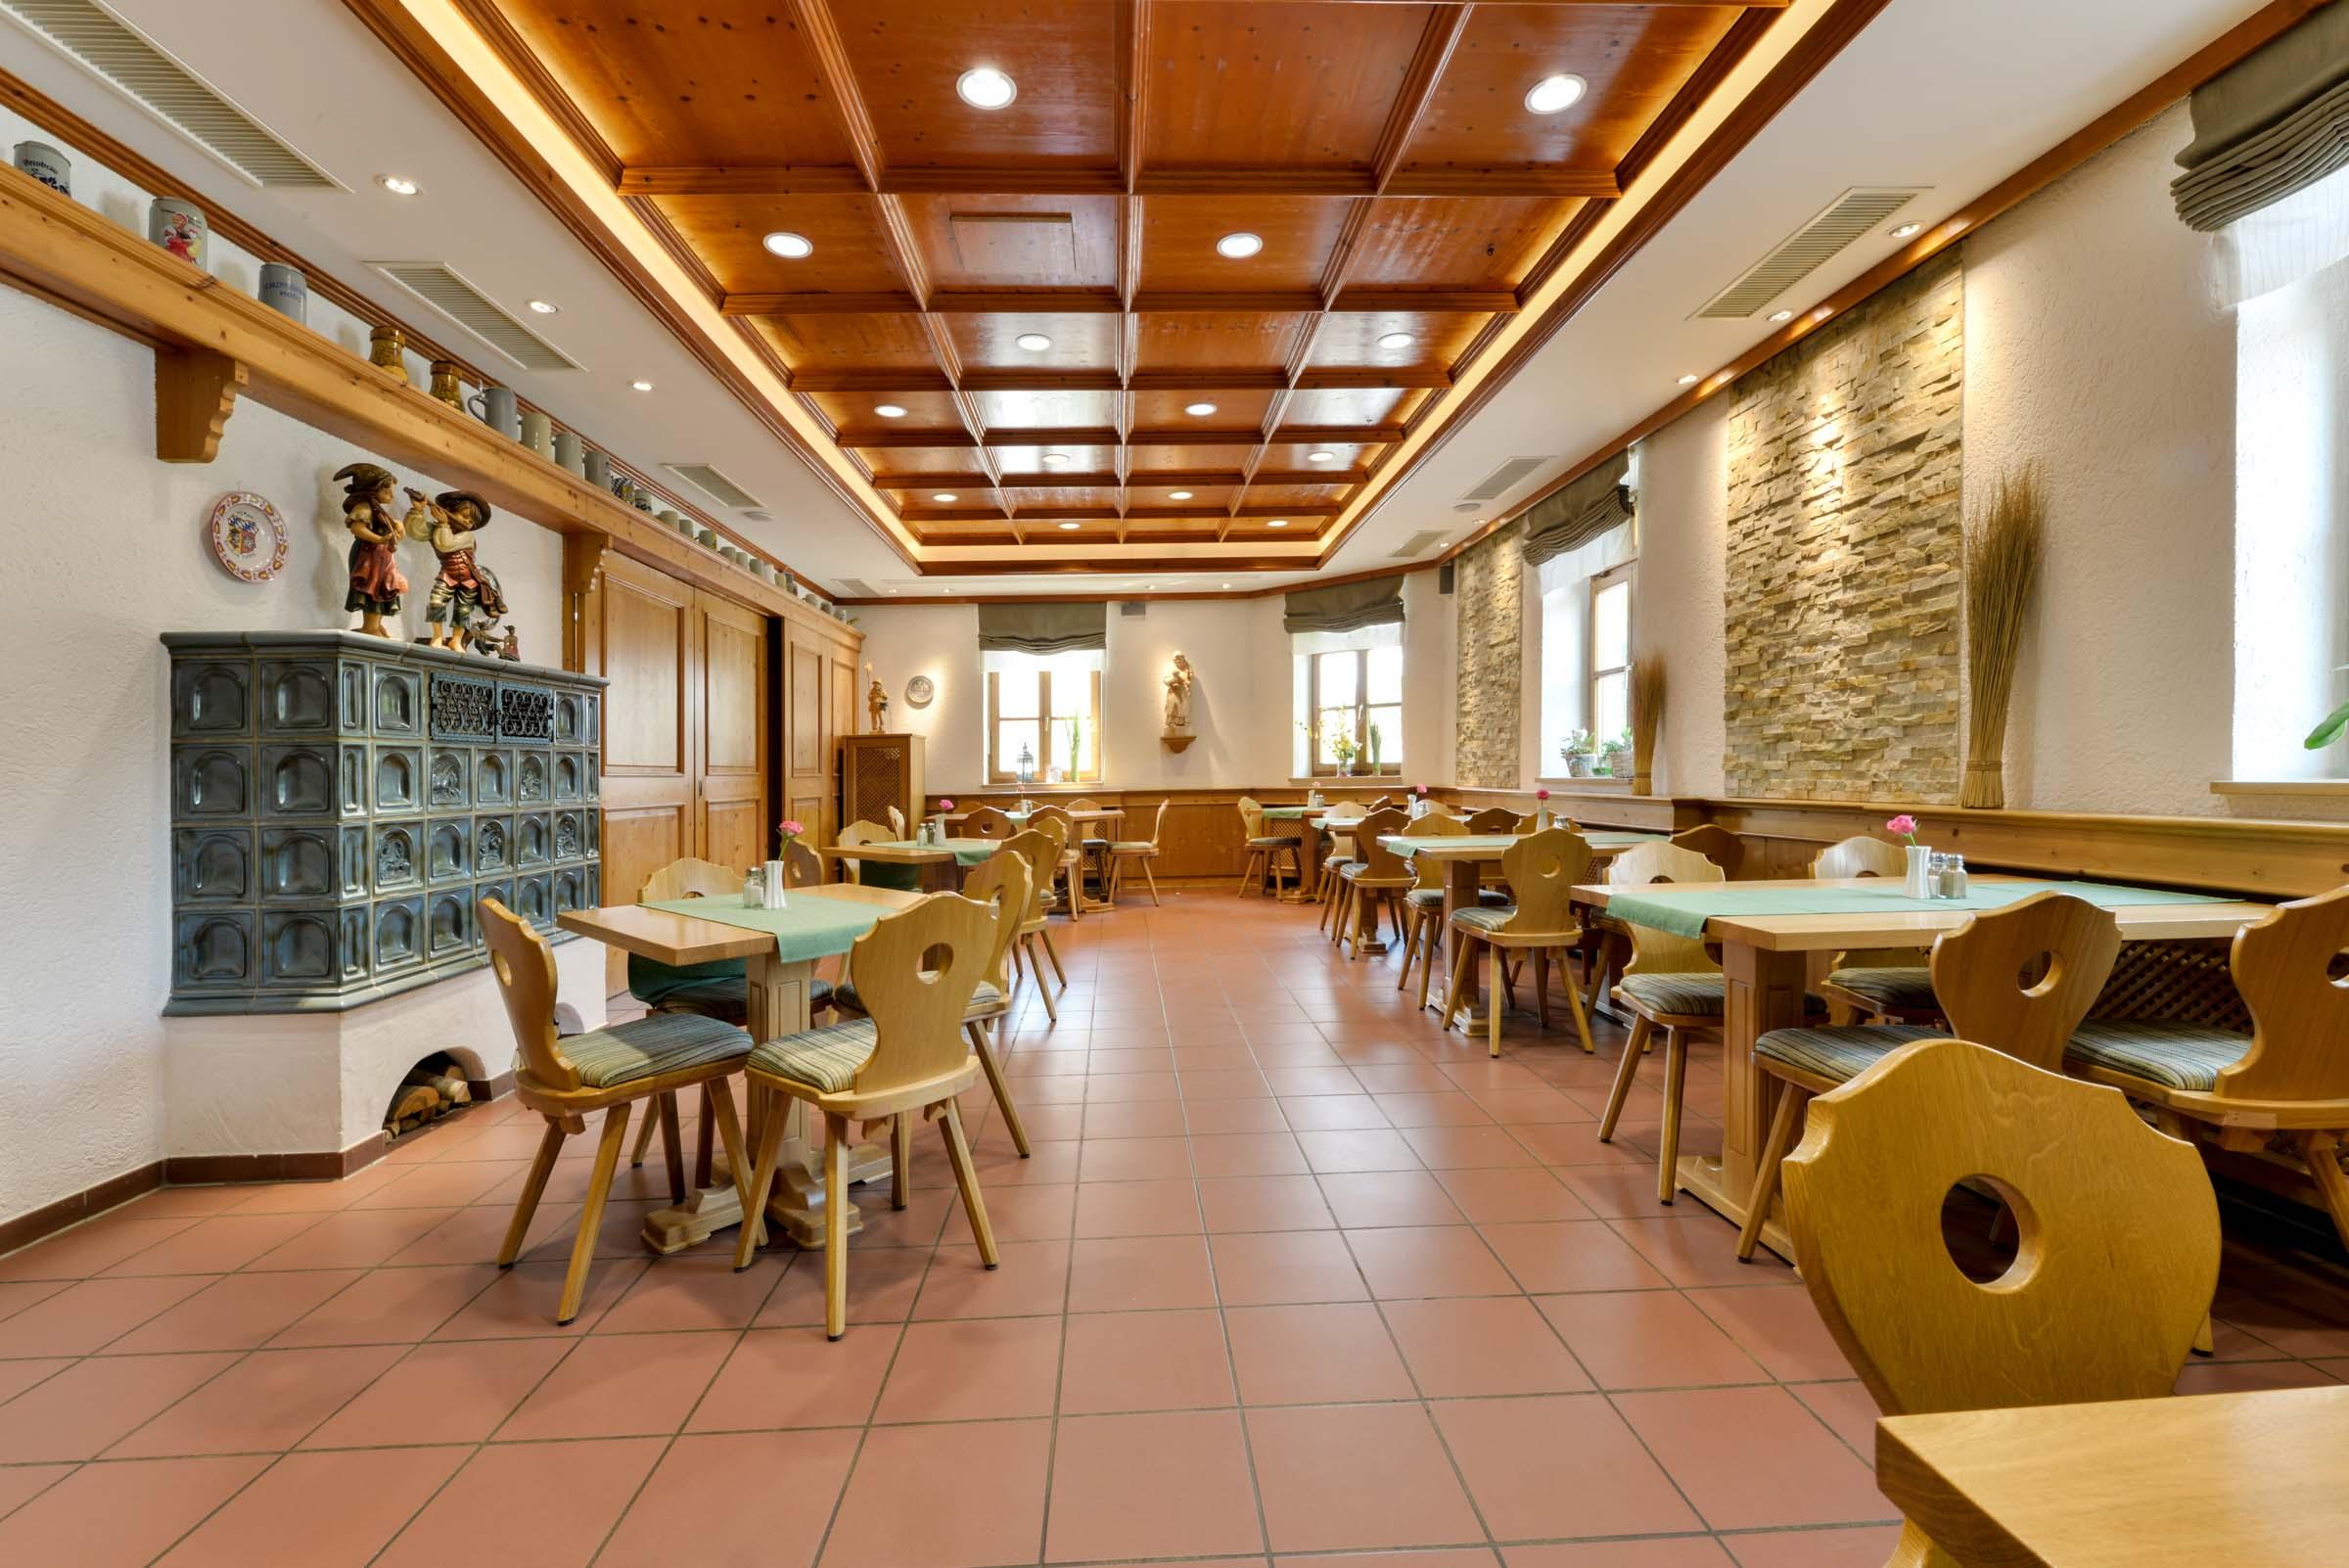 Nagerl - Bavarian restaurant at Munich Airport